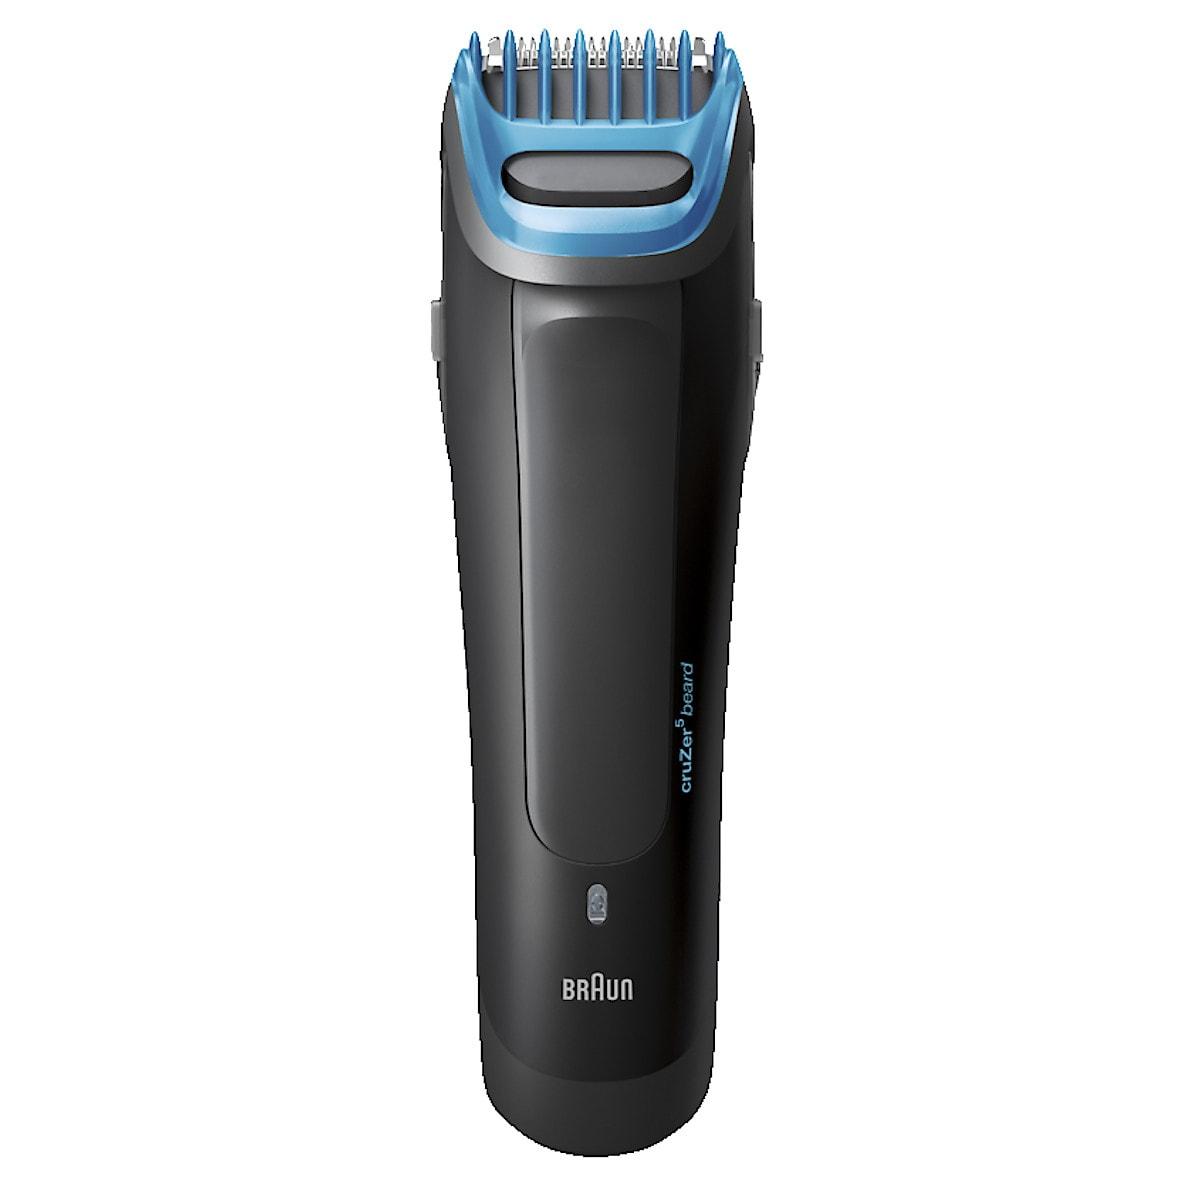 Skäggtrimmer Braun CruZer 5 Beard